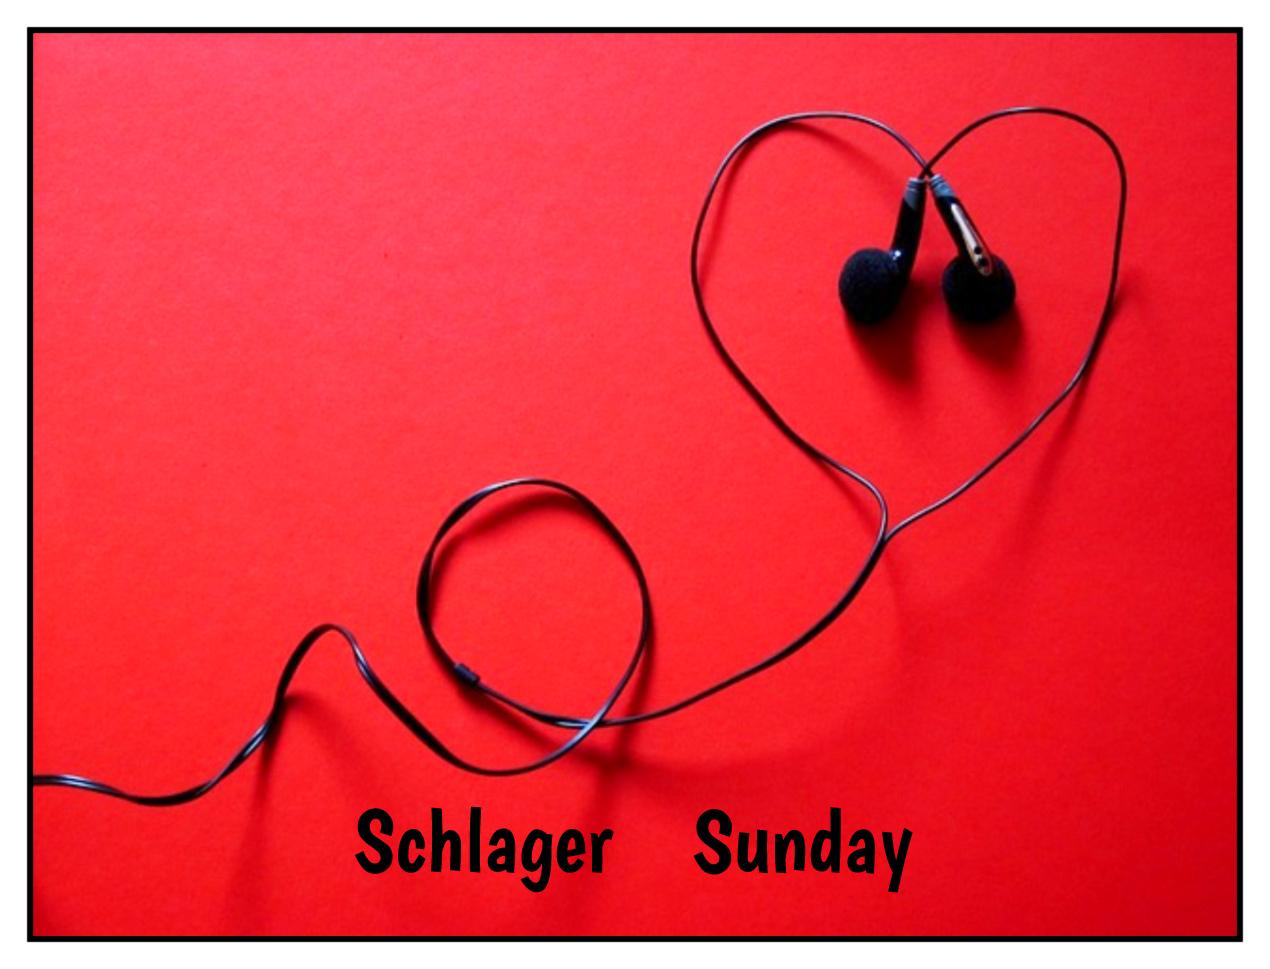 Be kitschig blog Schlager Sunday everyday is like sunday